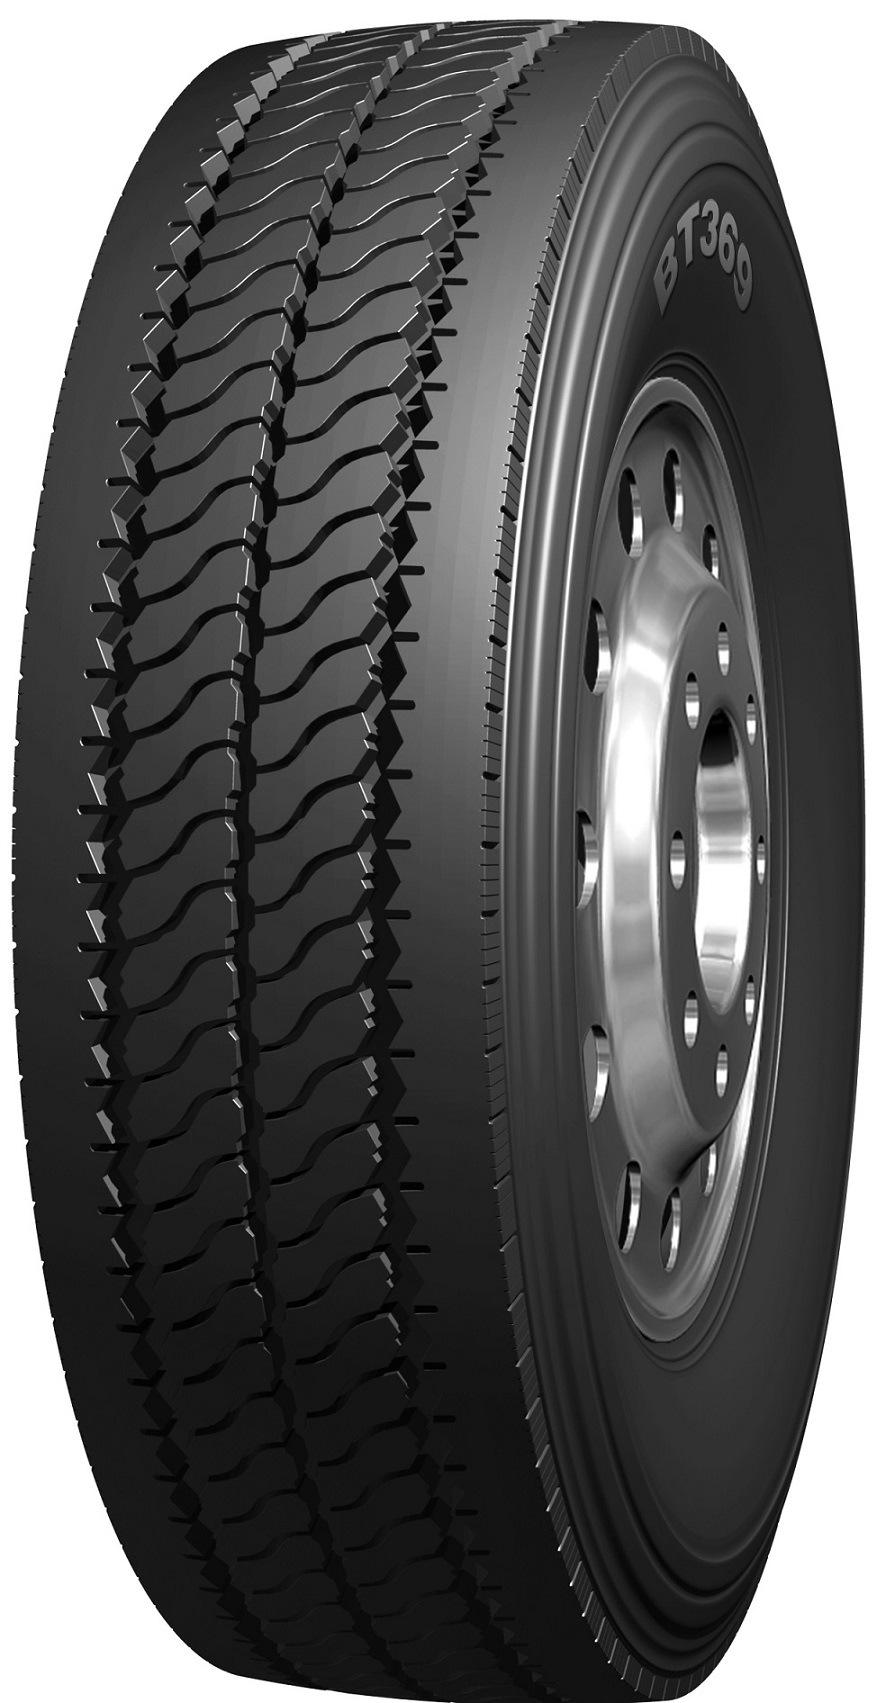 All Steel Radial Truck Tyre 12.00r20 13r22.5 315/80r22.5 TBR Tyre